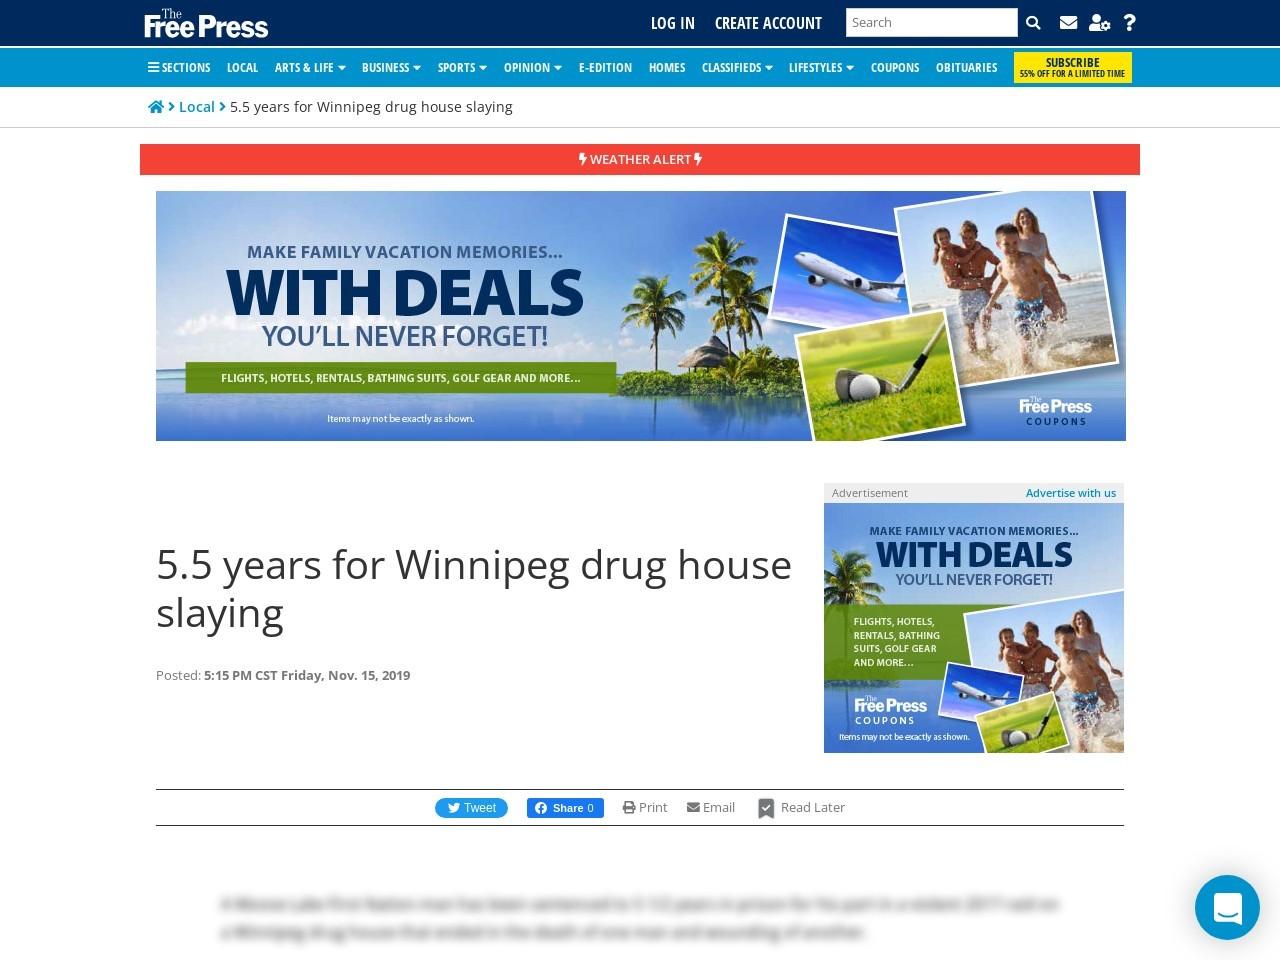 5.5 years for Winnipeg drug house slaying